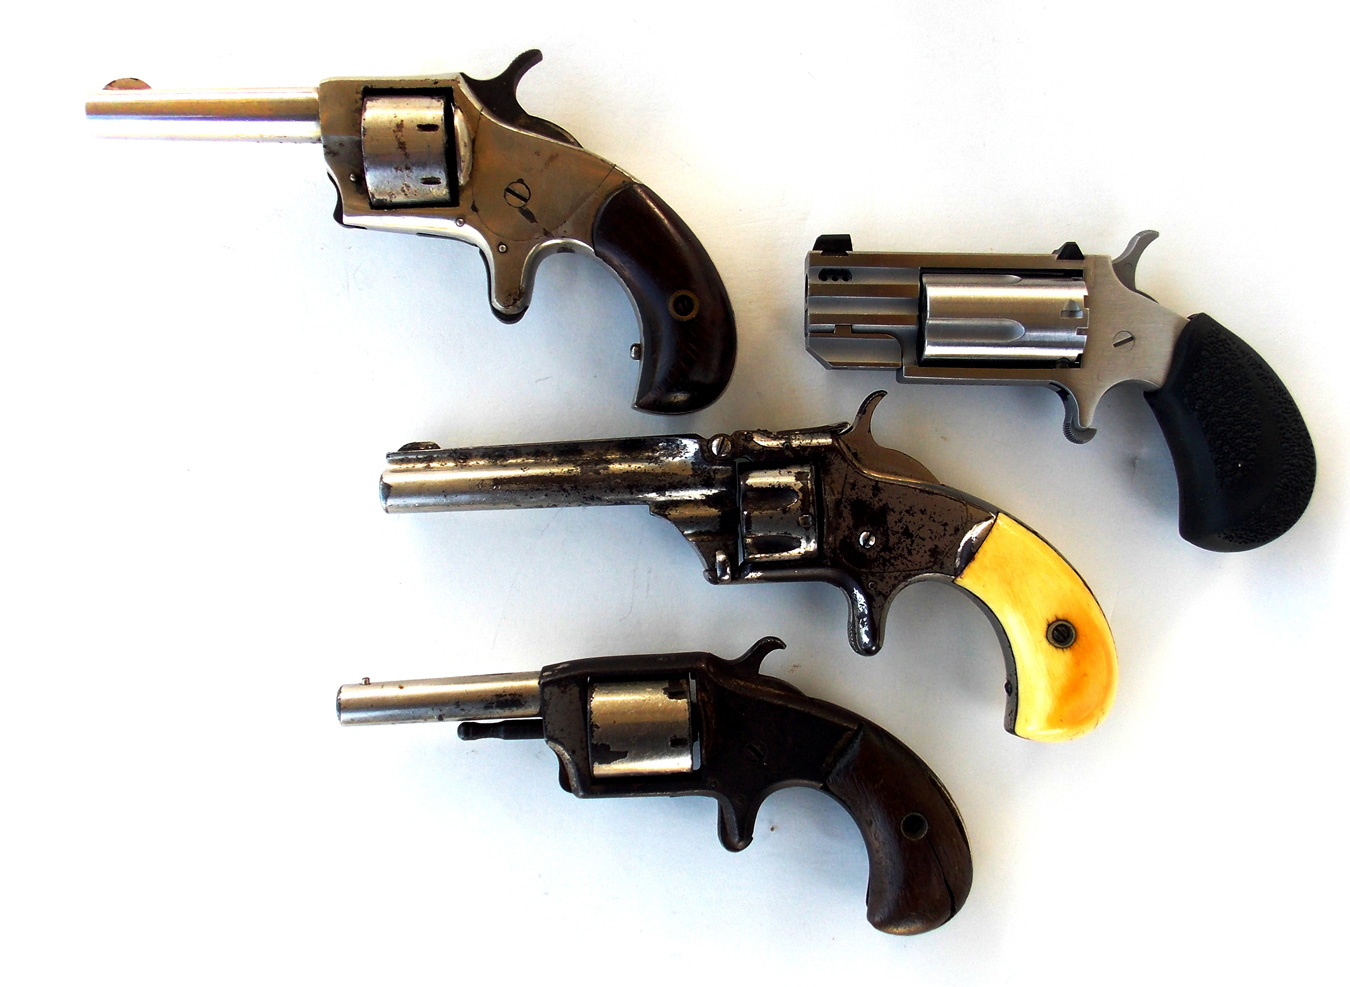 4 .22 caliber revolvers